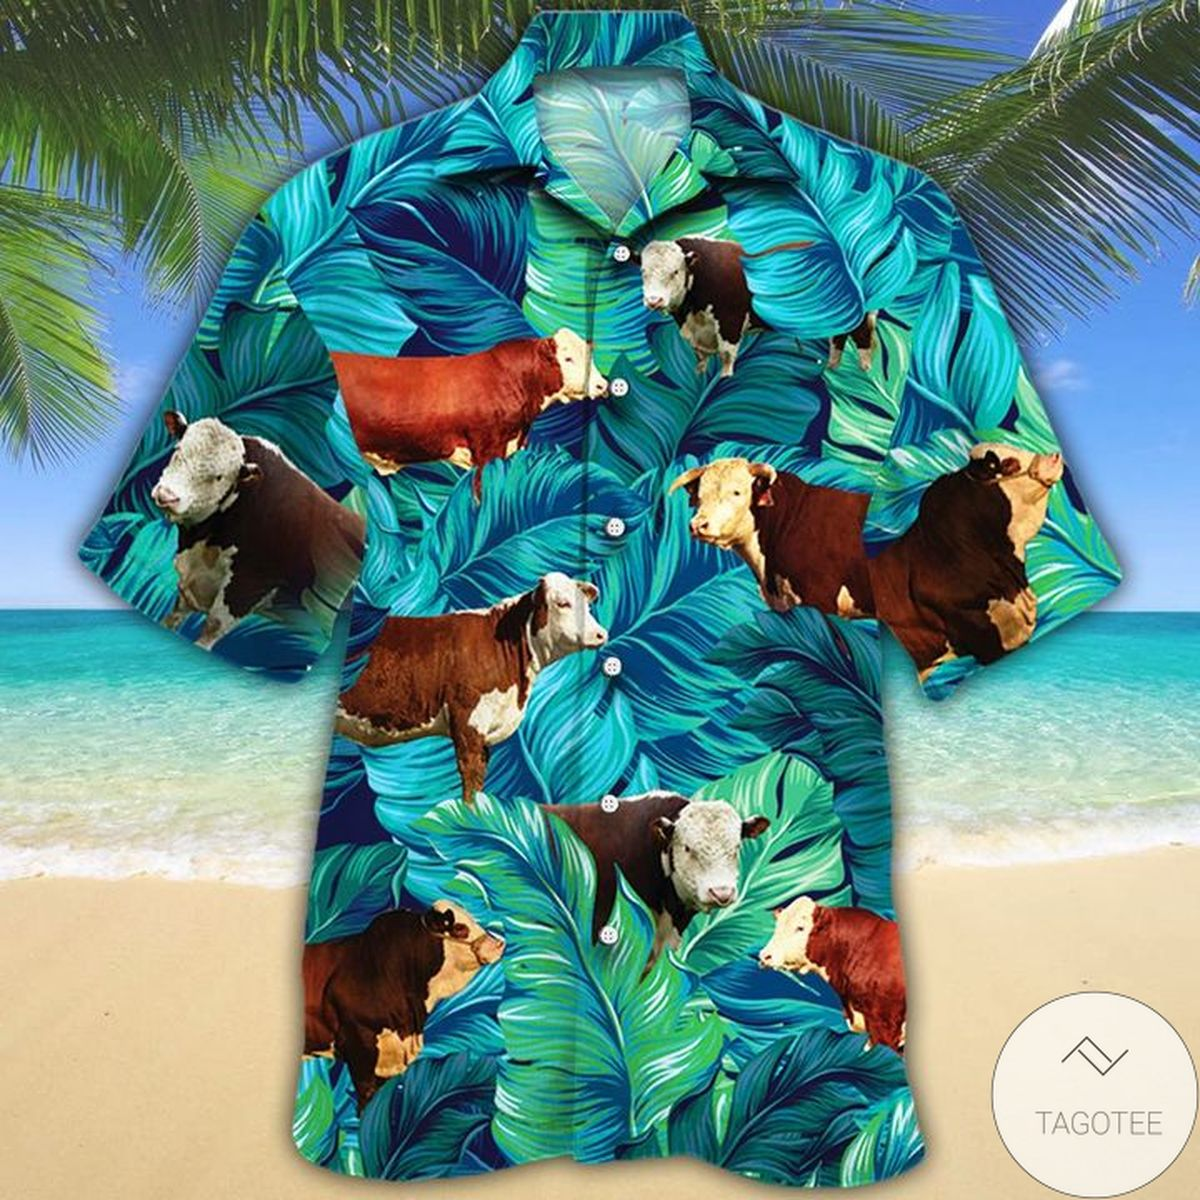 Discount Hereford Cattle Lovers Hawaiian Shirt